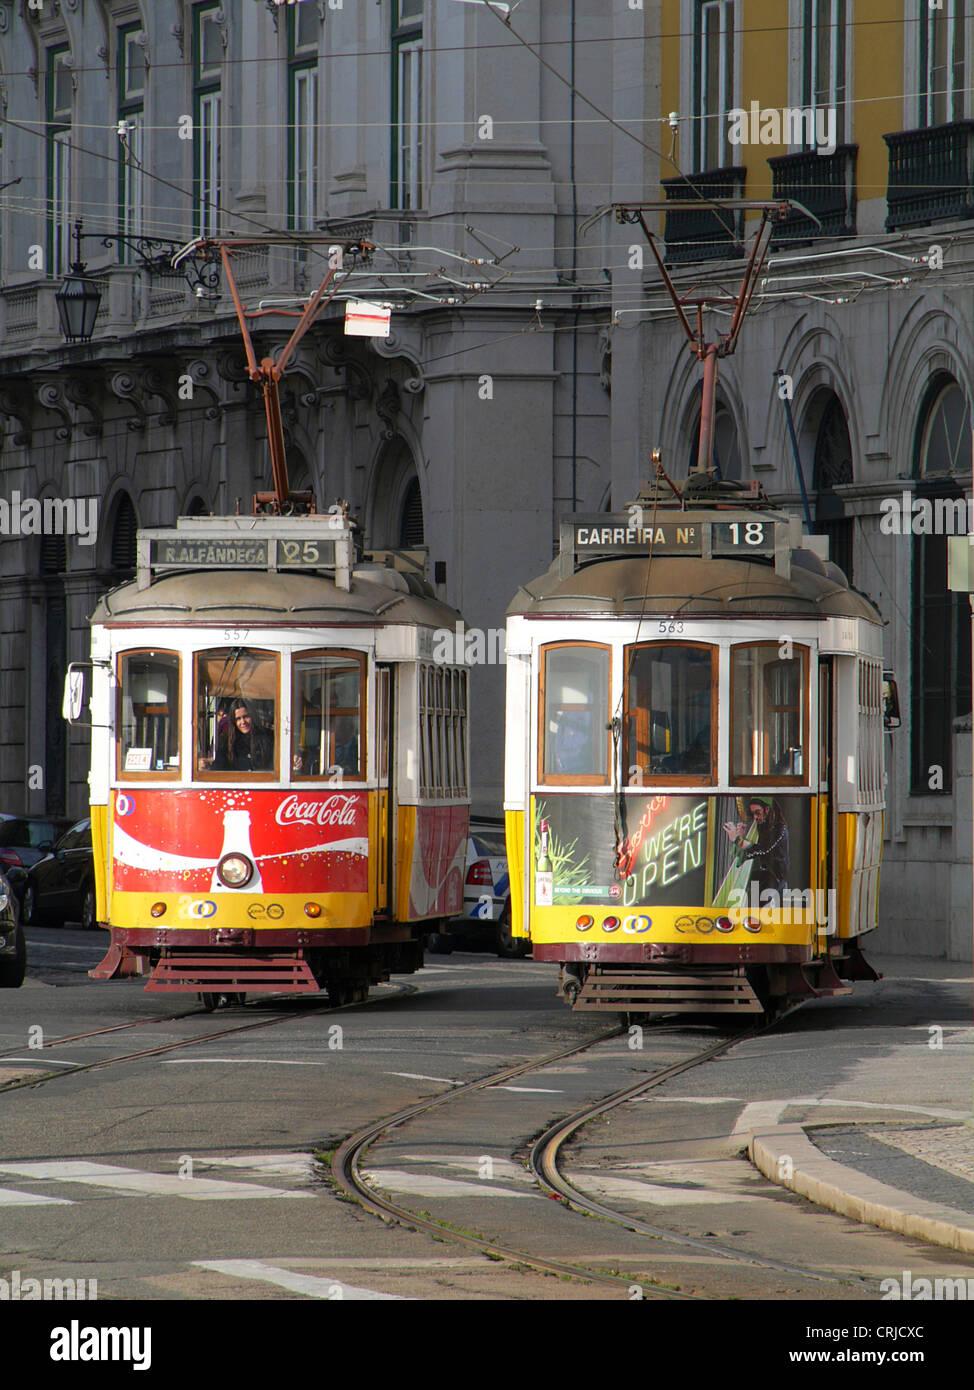 two streetcars meeting, Portugal, Lisbon - Stock Image